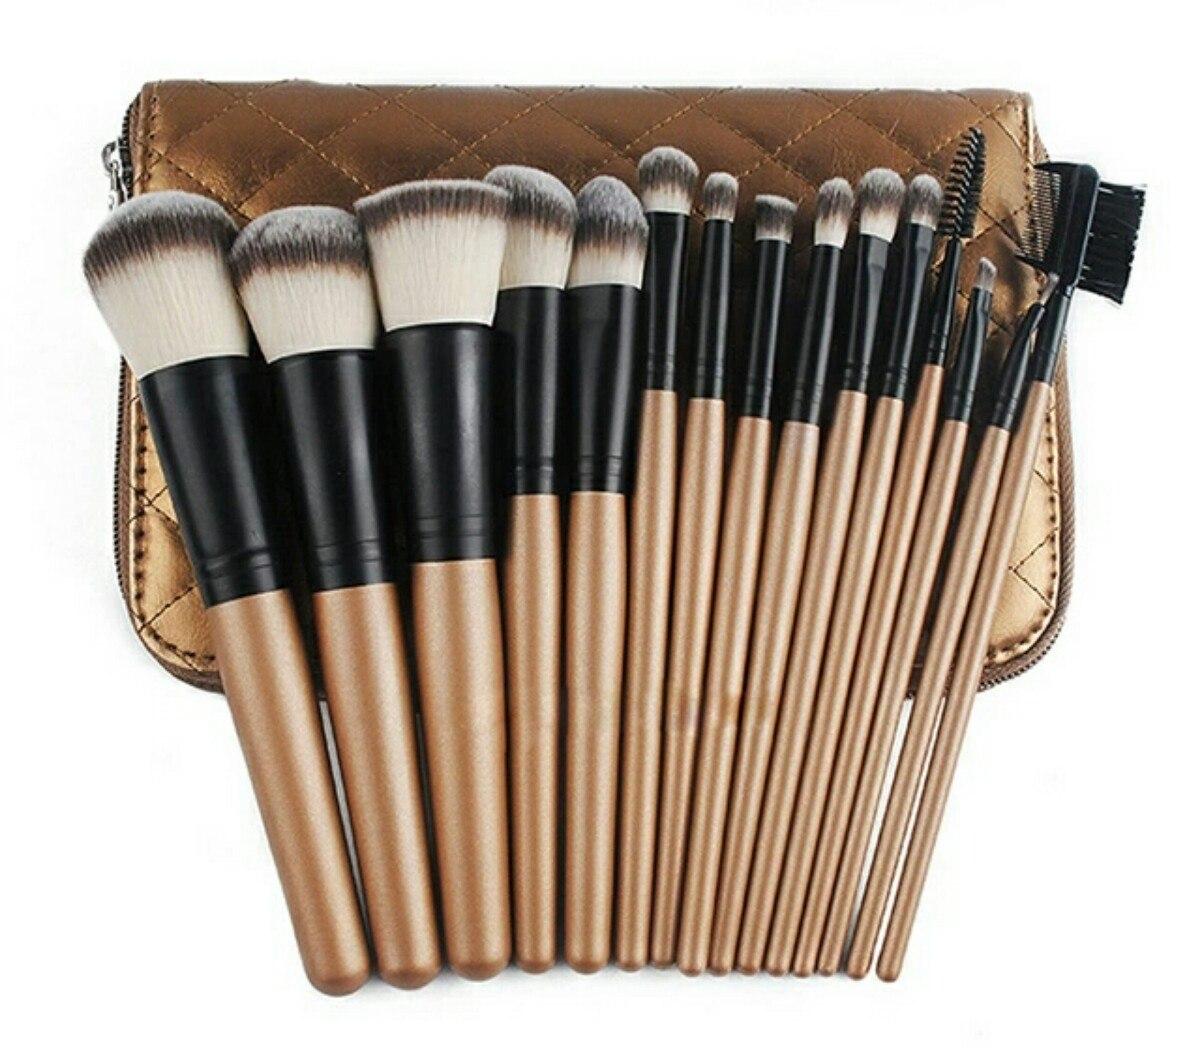 kit de brochas para maquillaje profesional